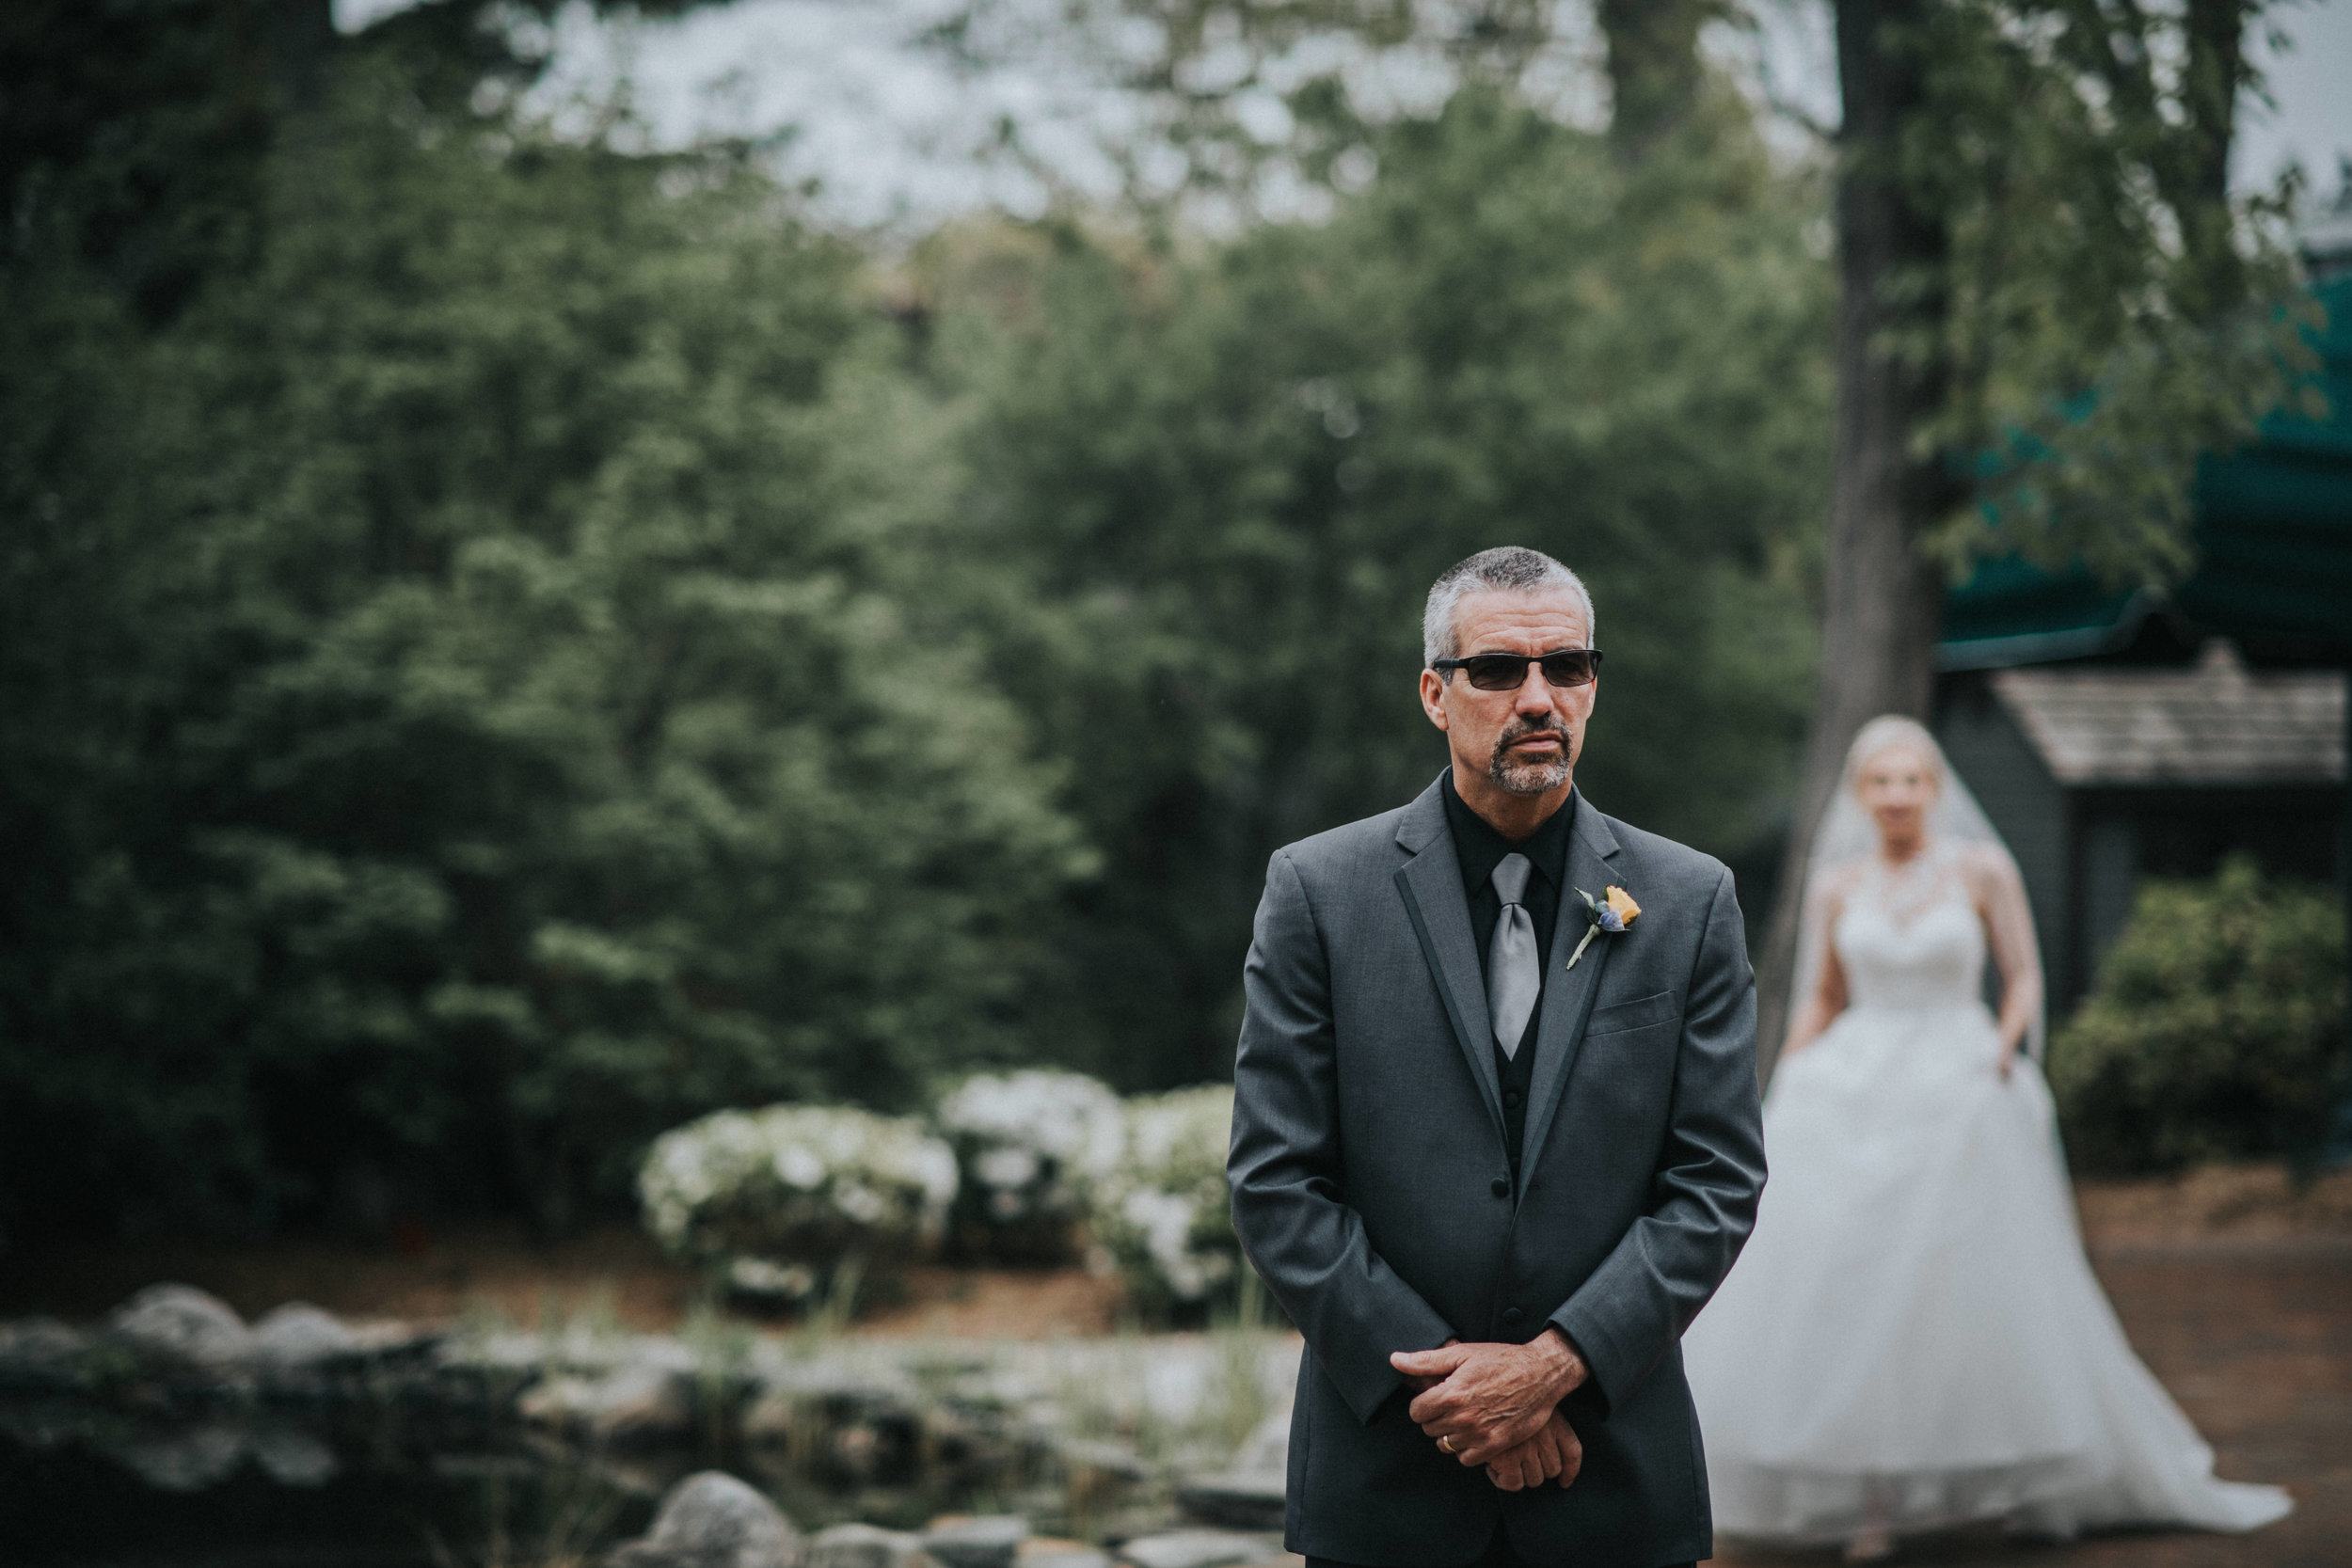 New-Jersey-Wedding-Photographer-Megan&Nick-FirstLooks-4.jpg